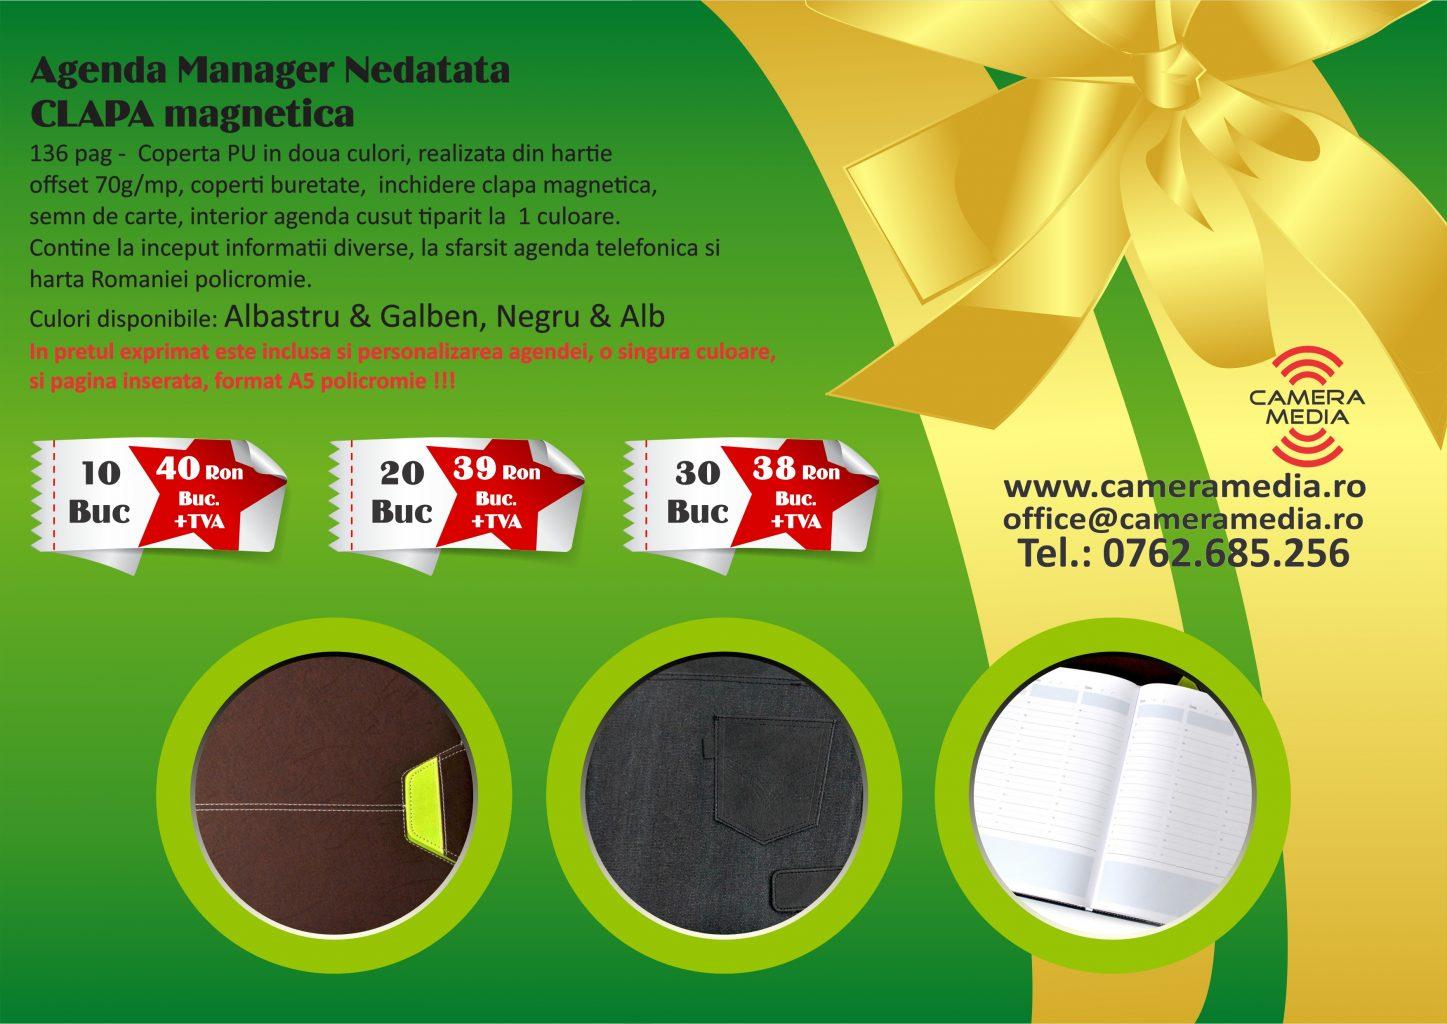 Agenda Manager Nedatata Personalizata 2019 Craiova Tiparituri Craiova Promotionale Craiova Calendare Personalizate Craiova 2019 agende Personalizate Craiova